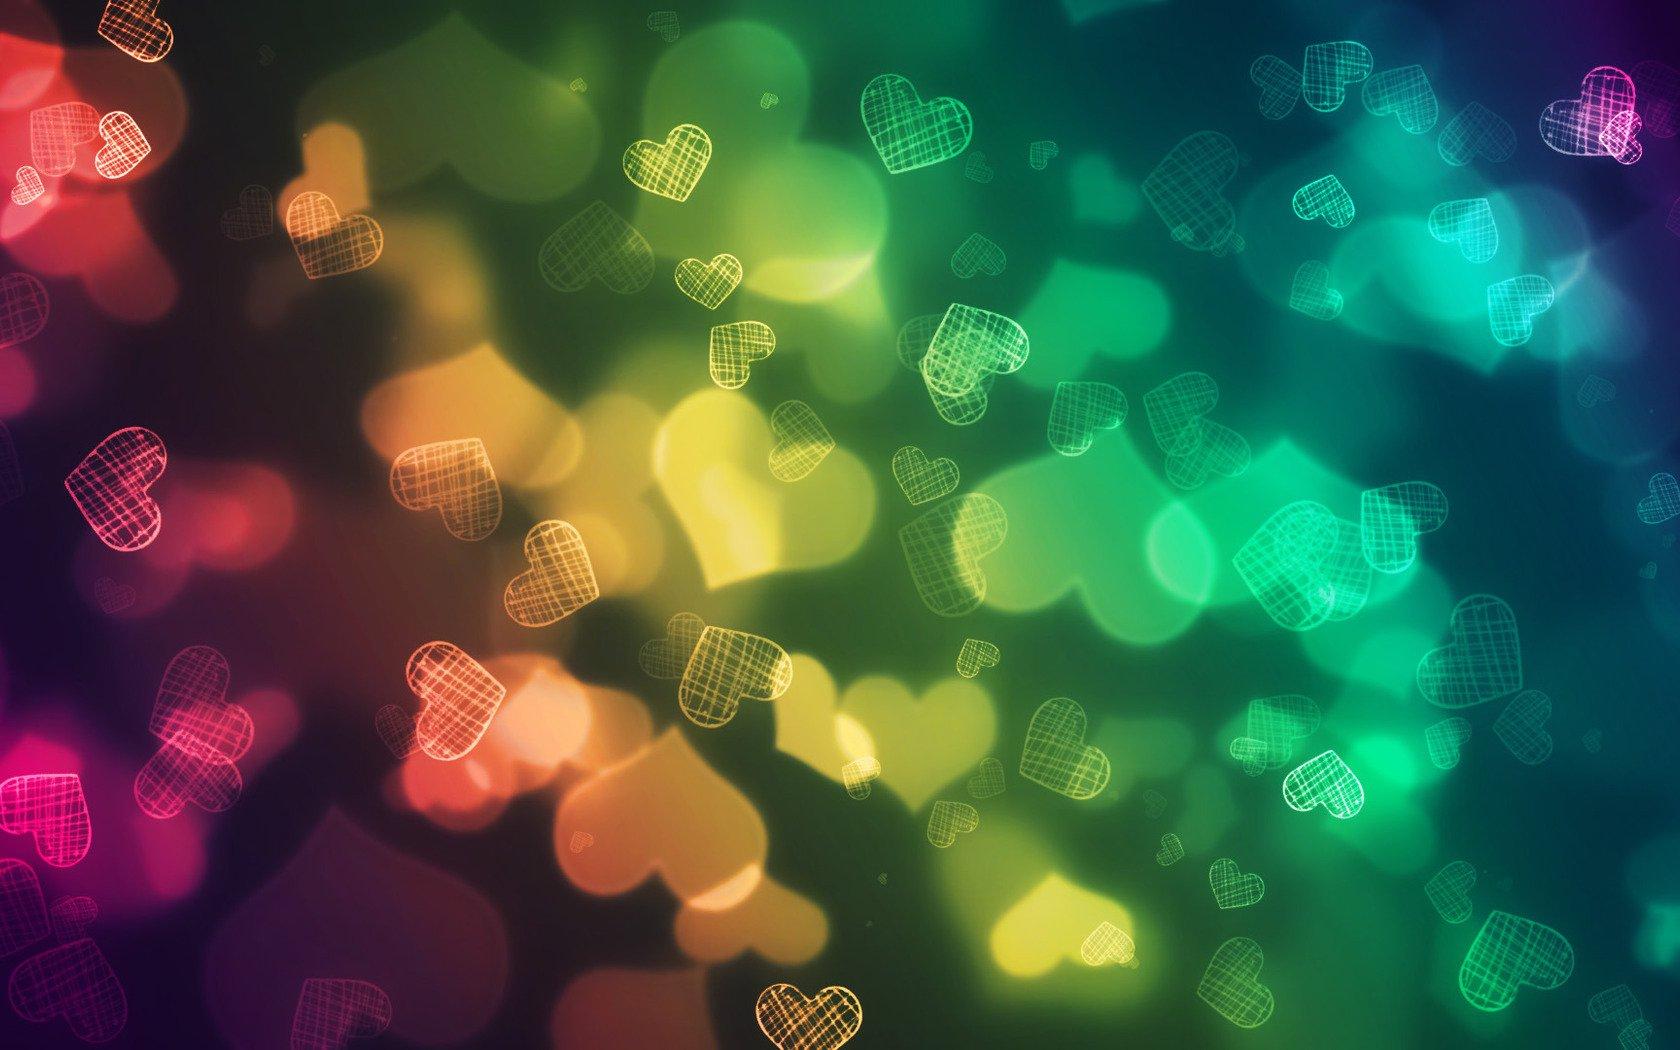 Simple Wallpaper Love Green - 400dfabd301bc267592a39a57619343d  Picture_6474100.jpg